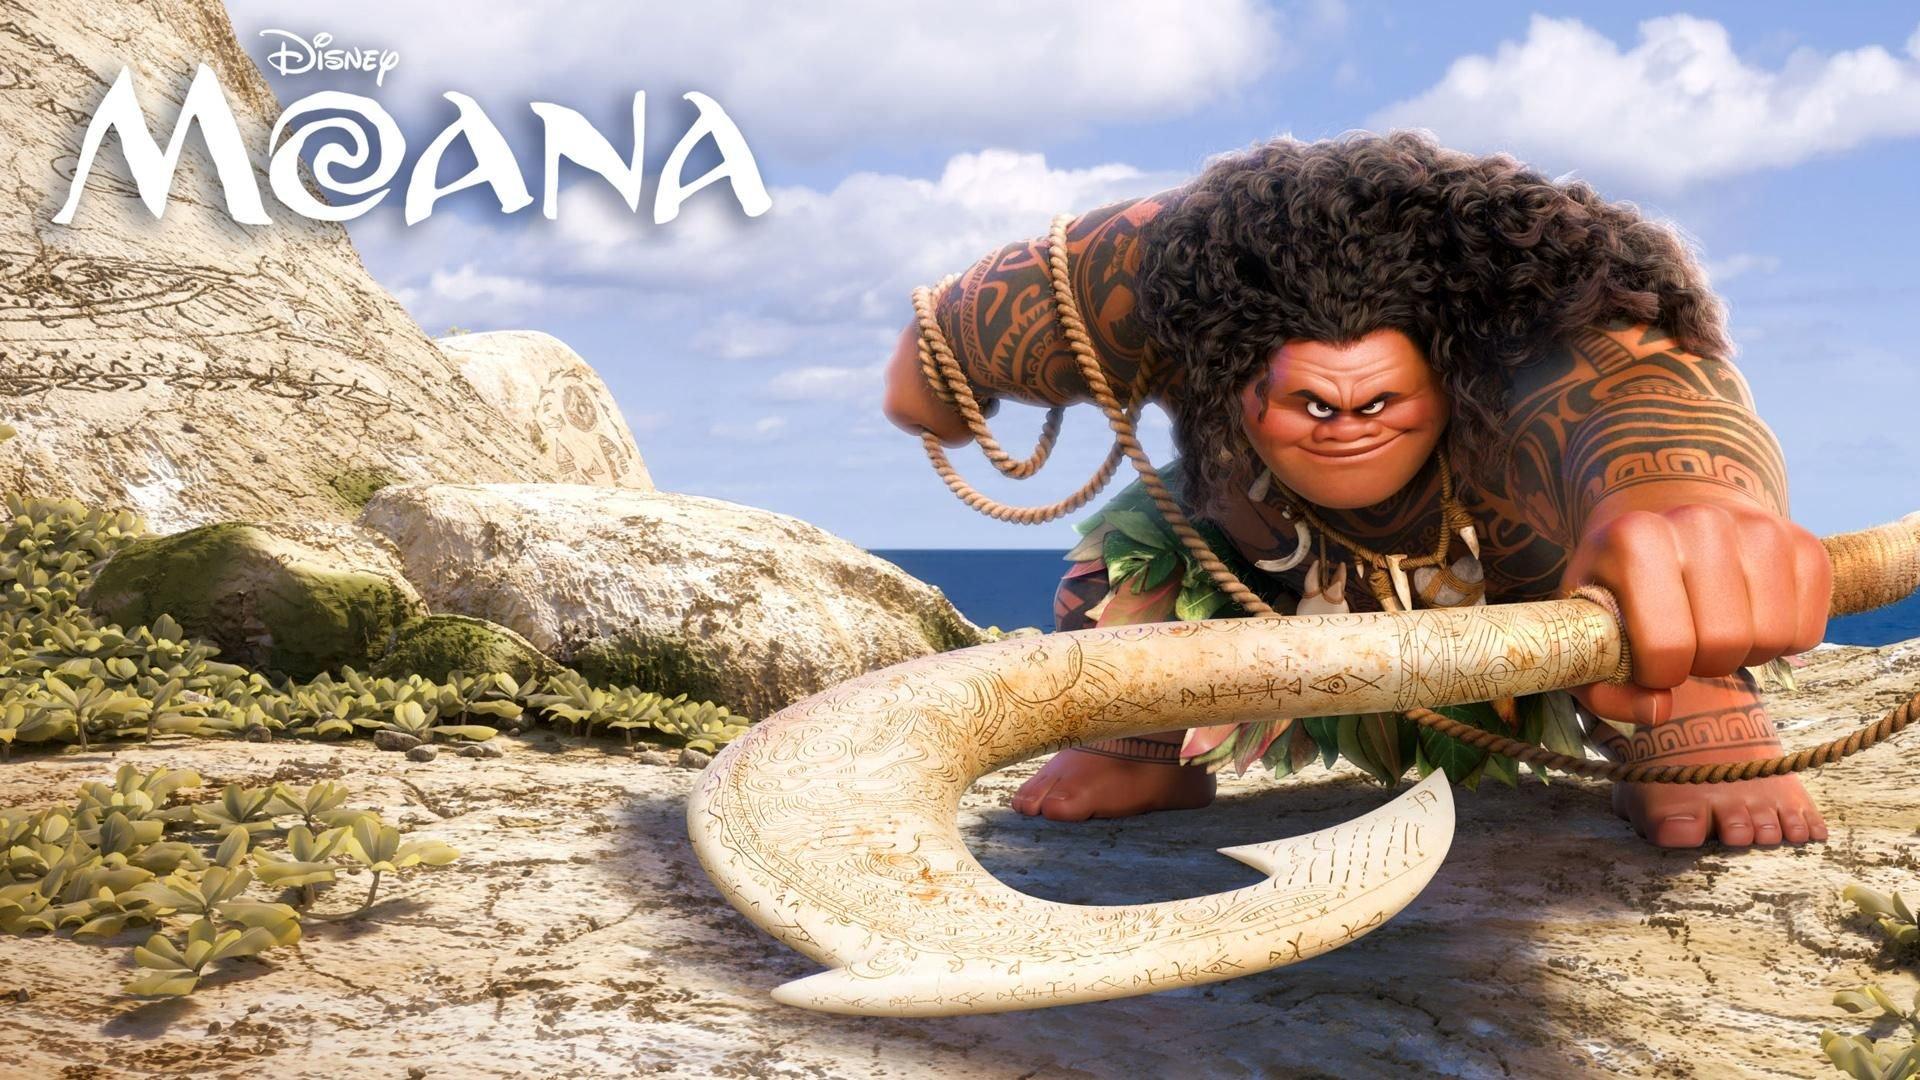 Moana Background Wallpaper